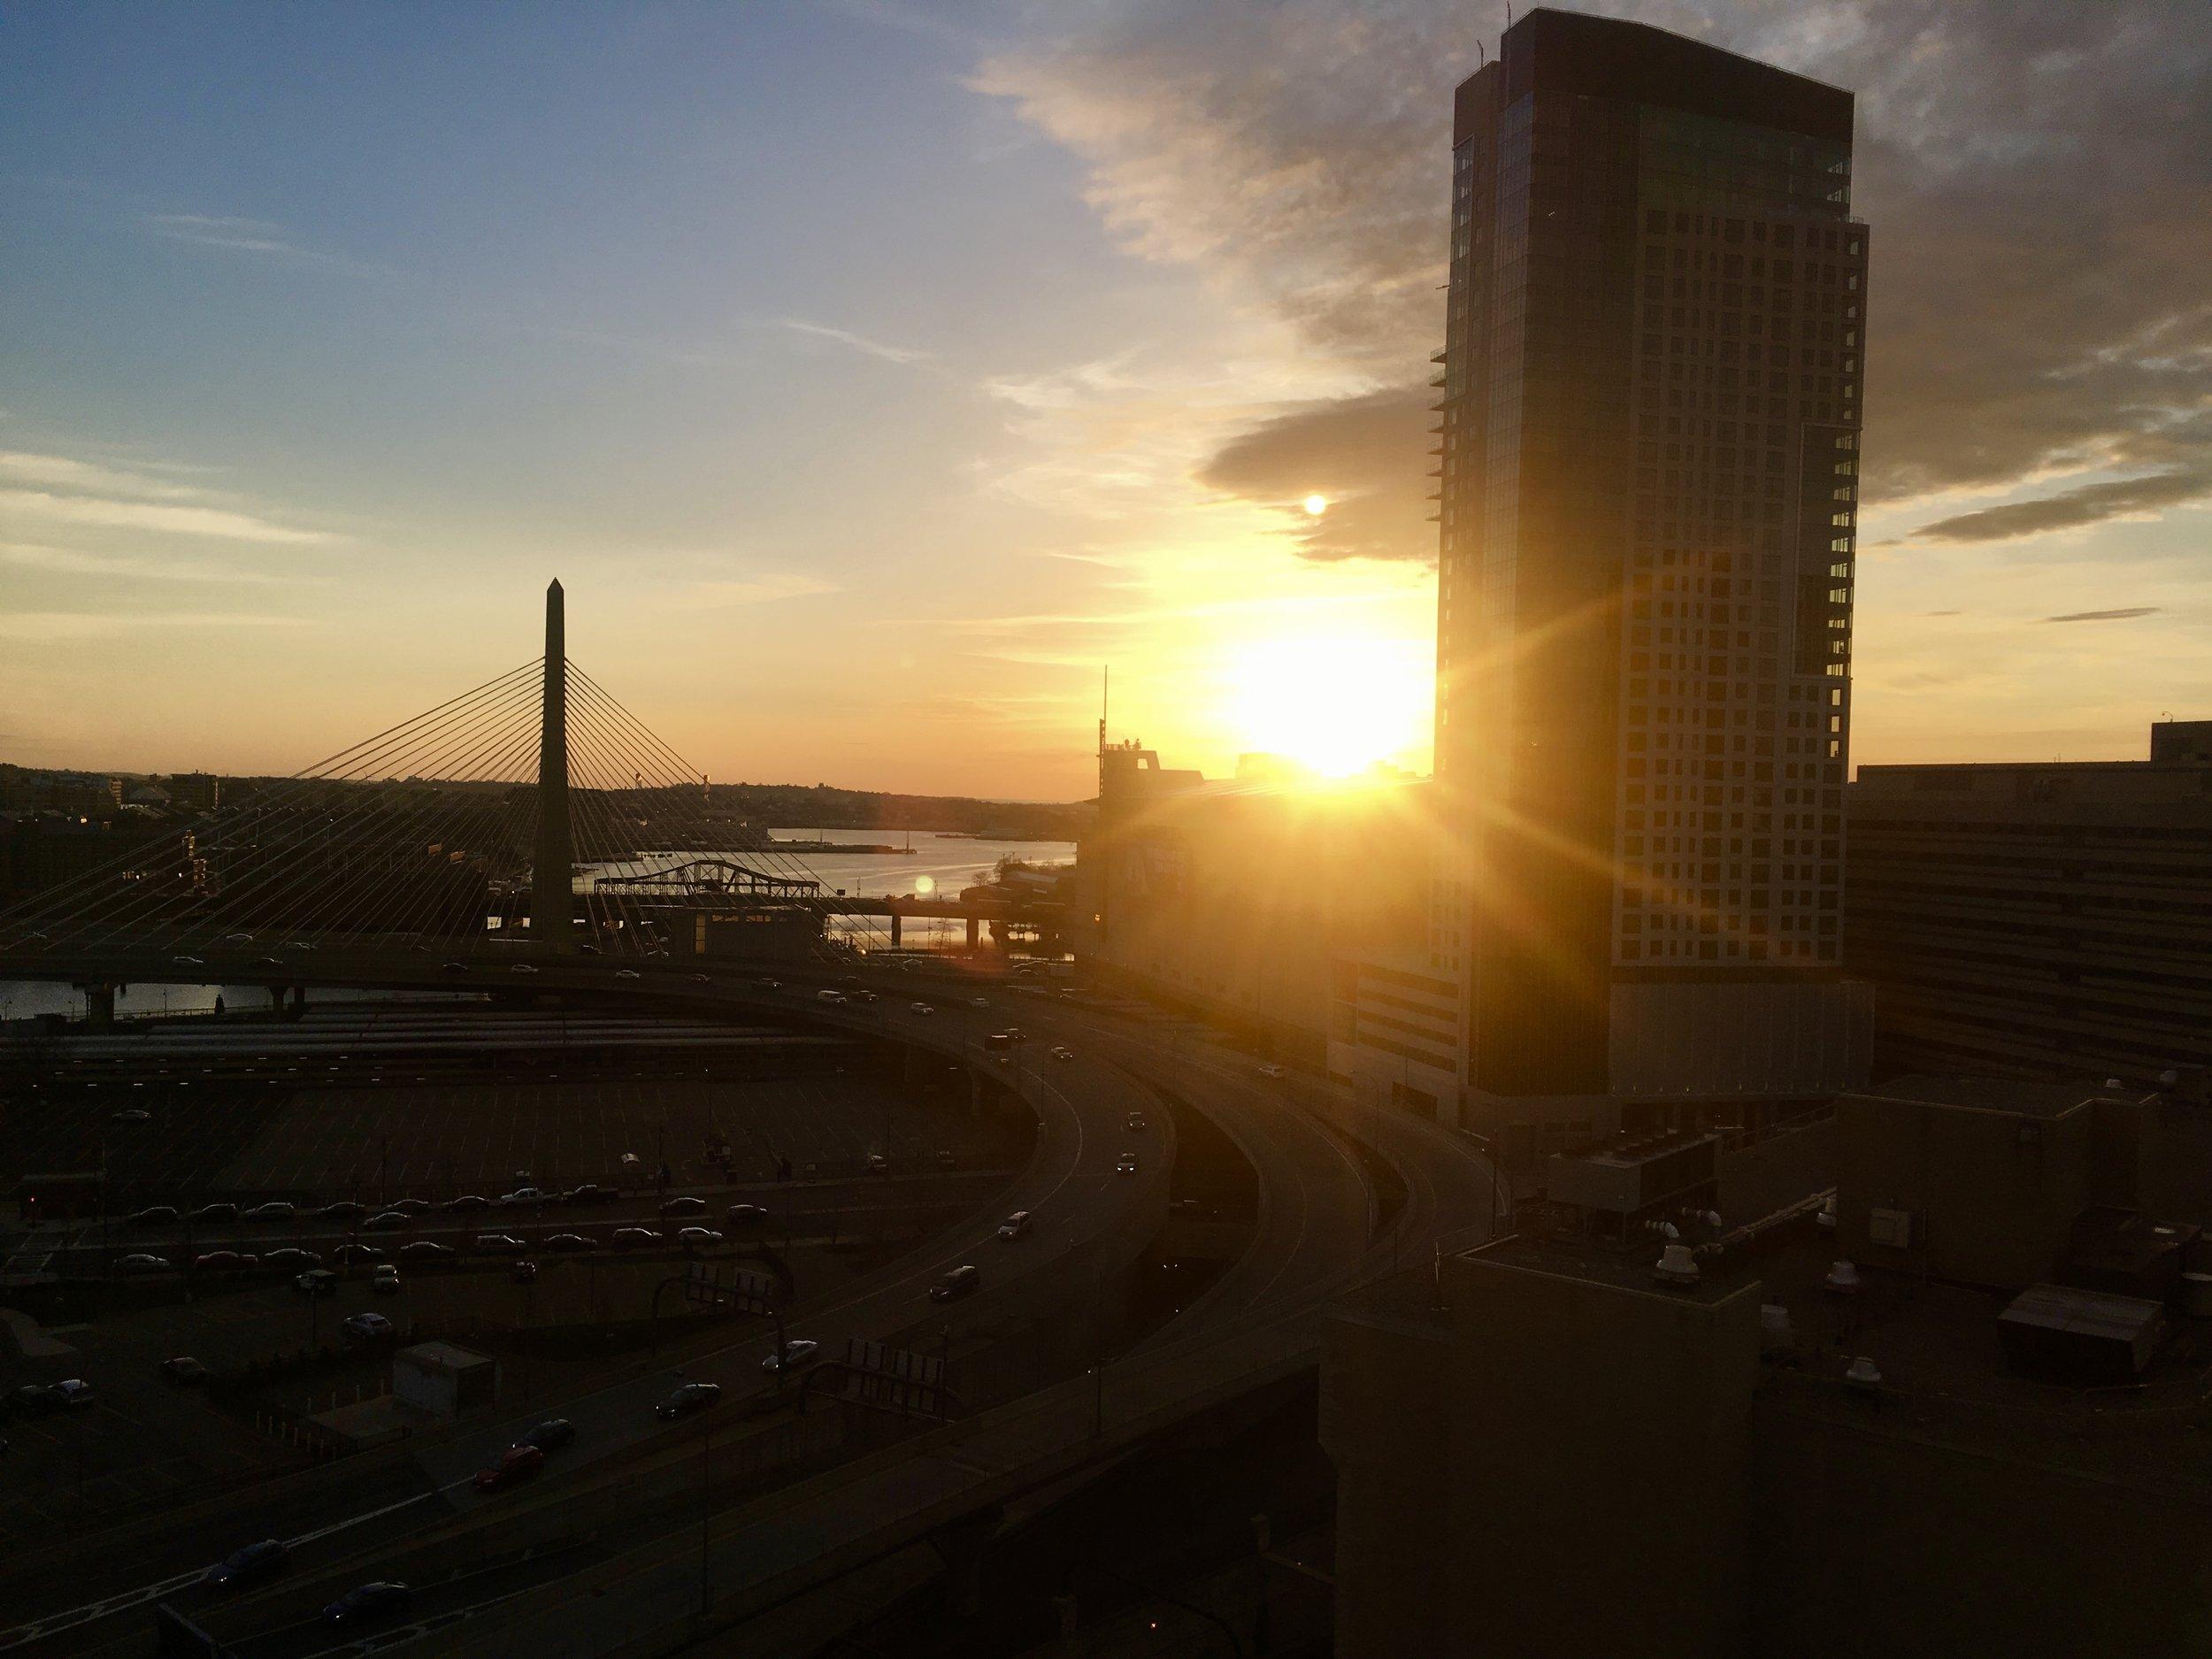 Good morning, Boston. Happy Patriot's Day!